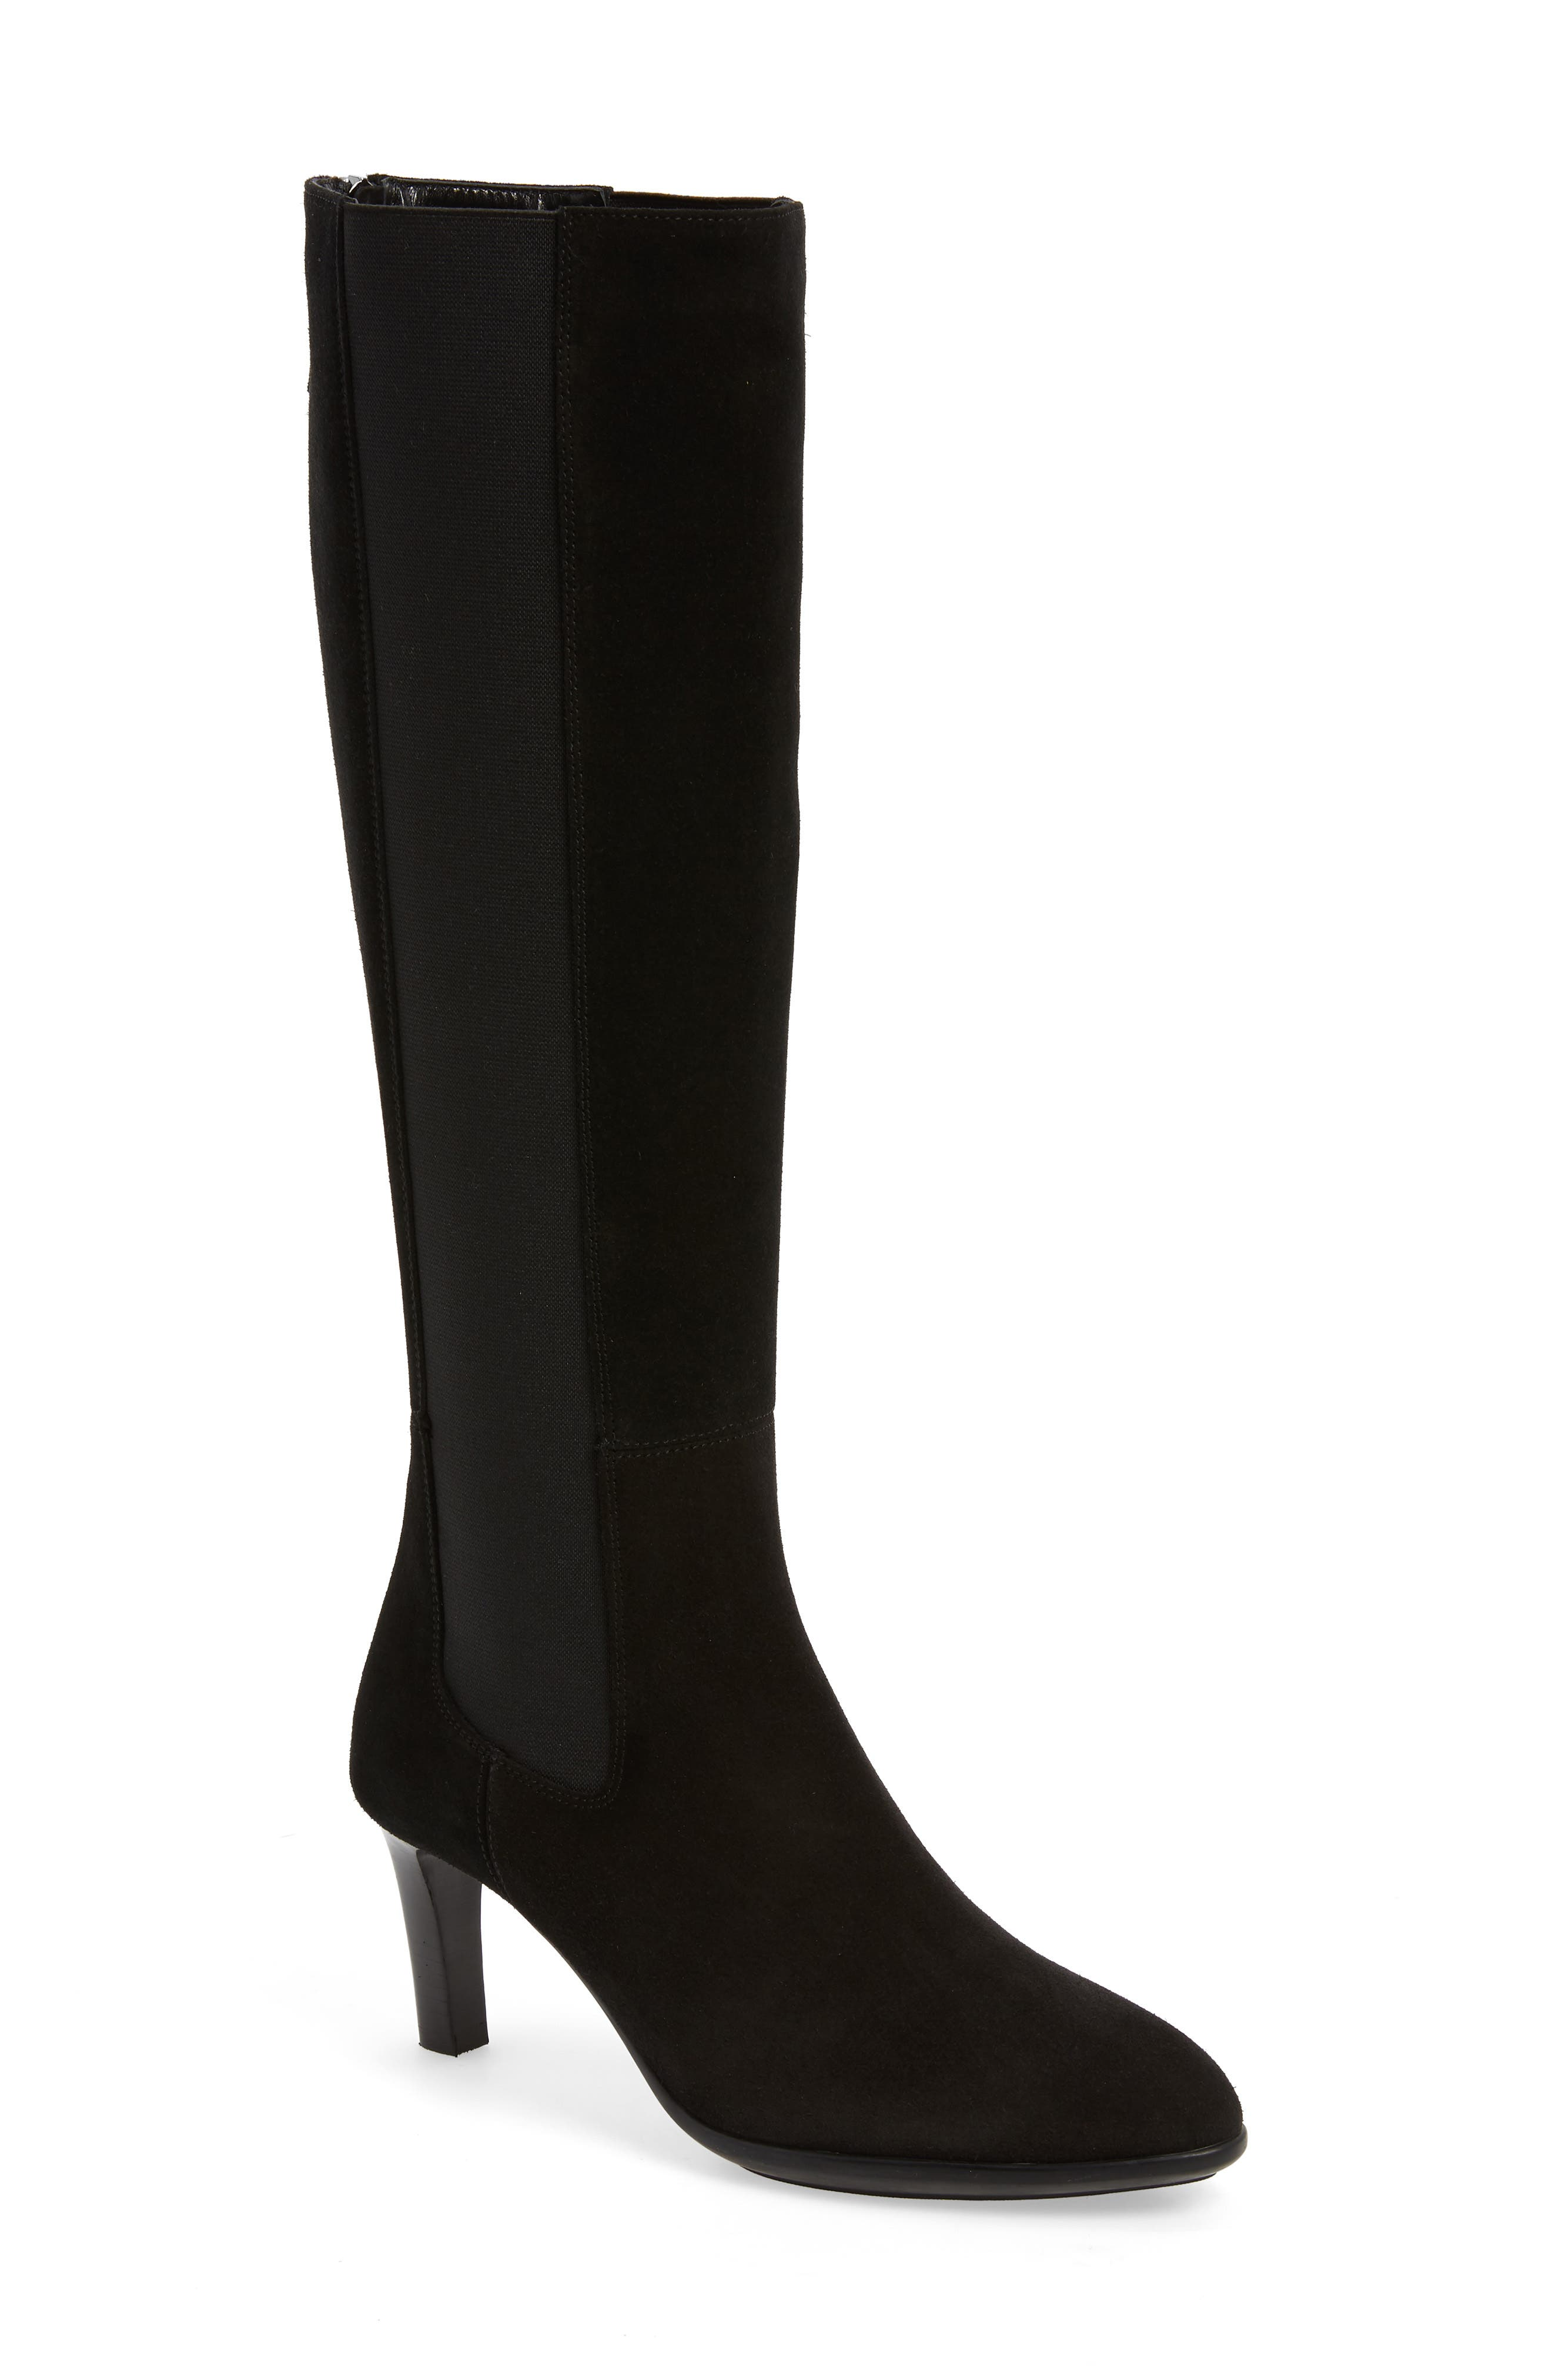 Aquatalia Dahliana Weatherproof Knee High Boot, Black